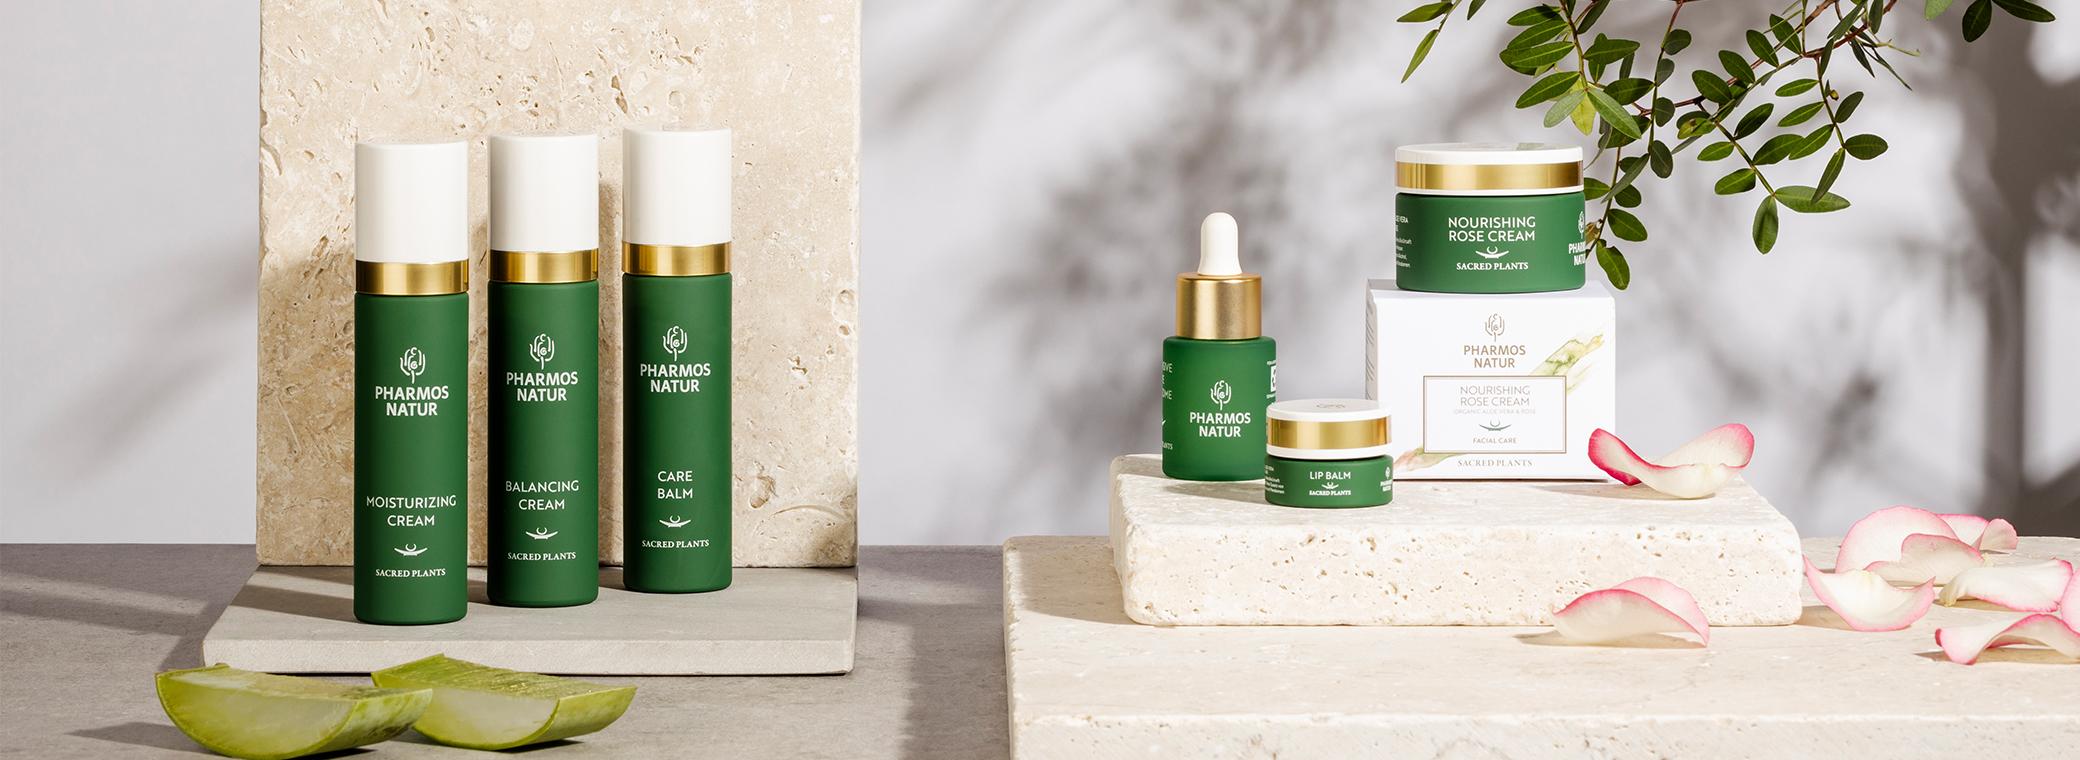 Produktabbild: sechs verschiedene, dunkelgrüne Facial Care Produkte abgebildet